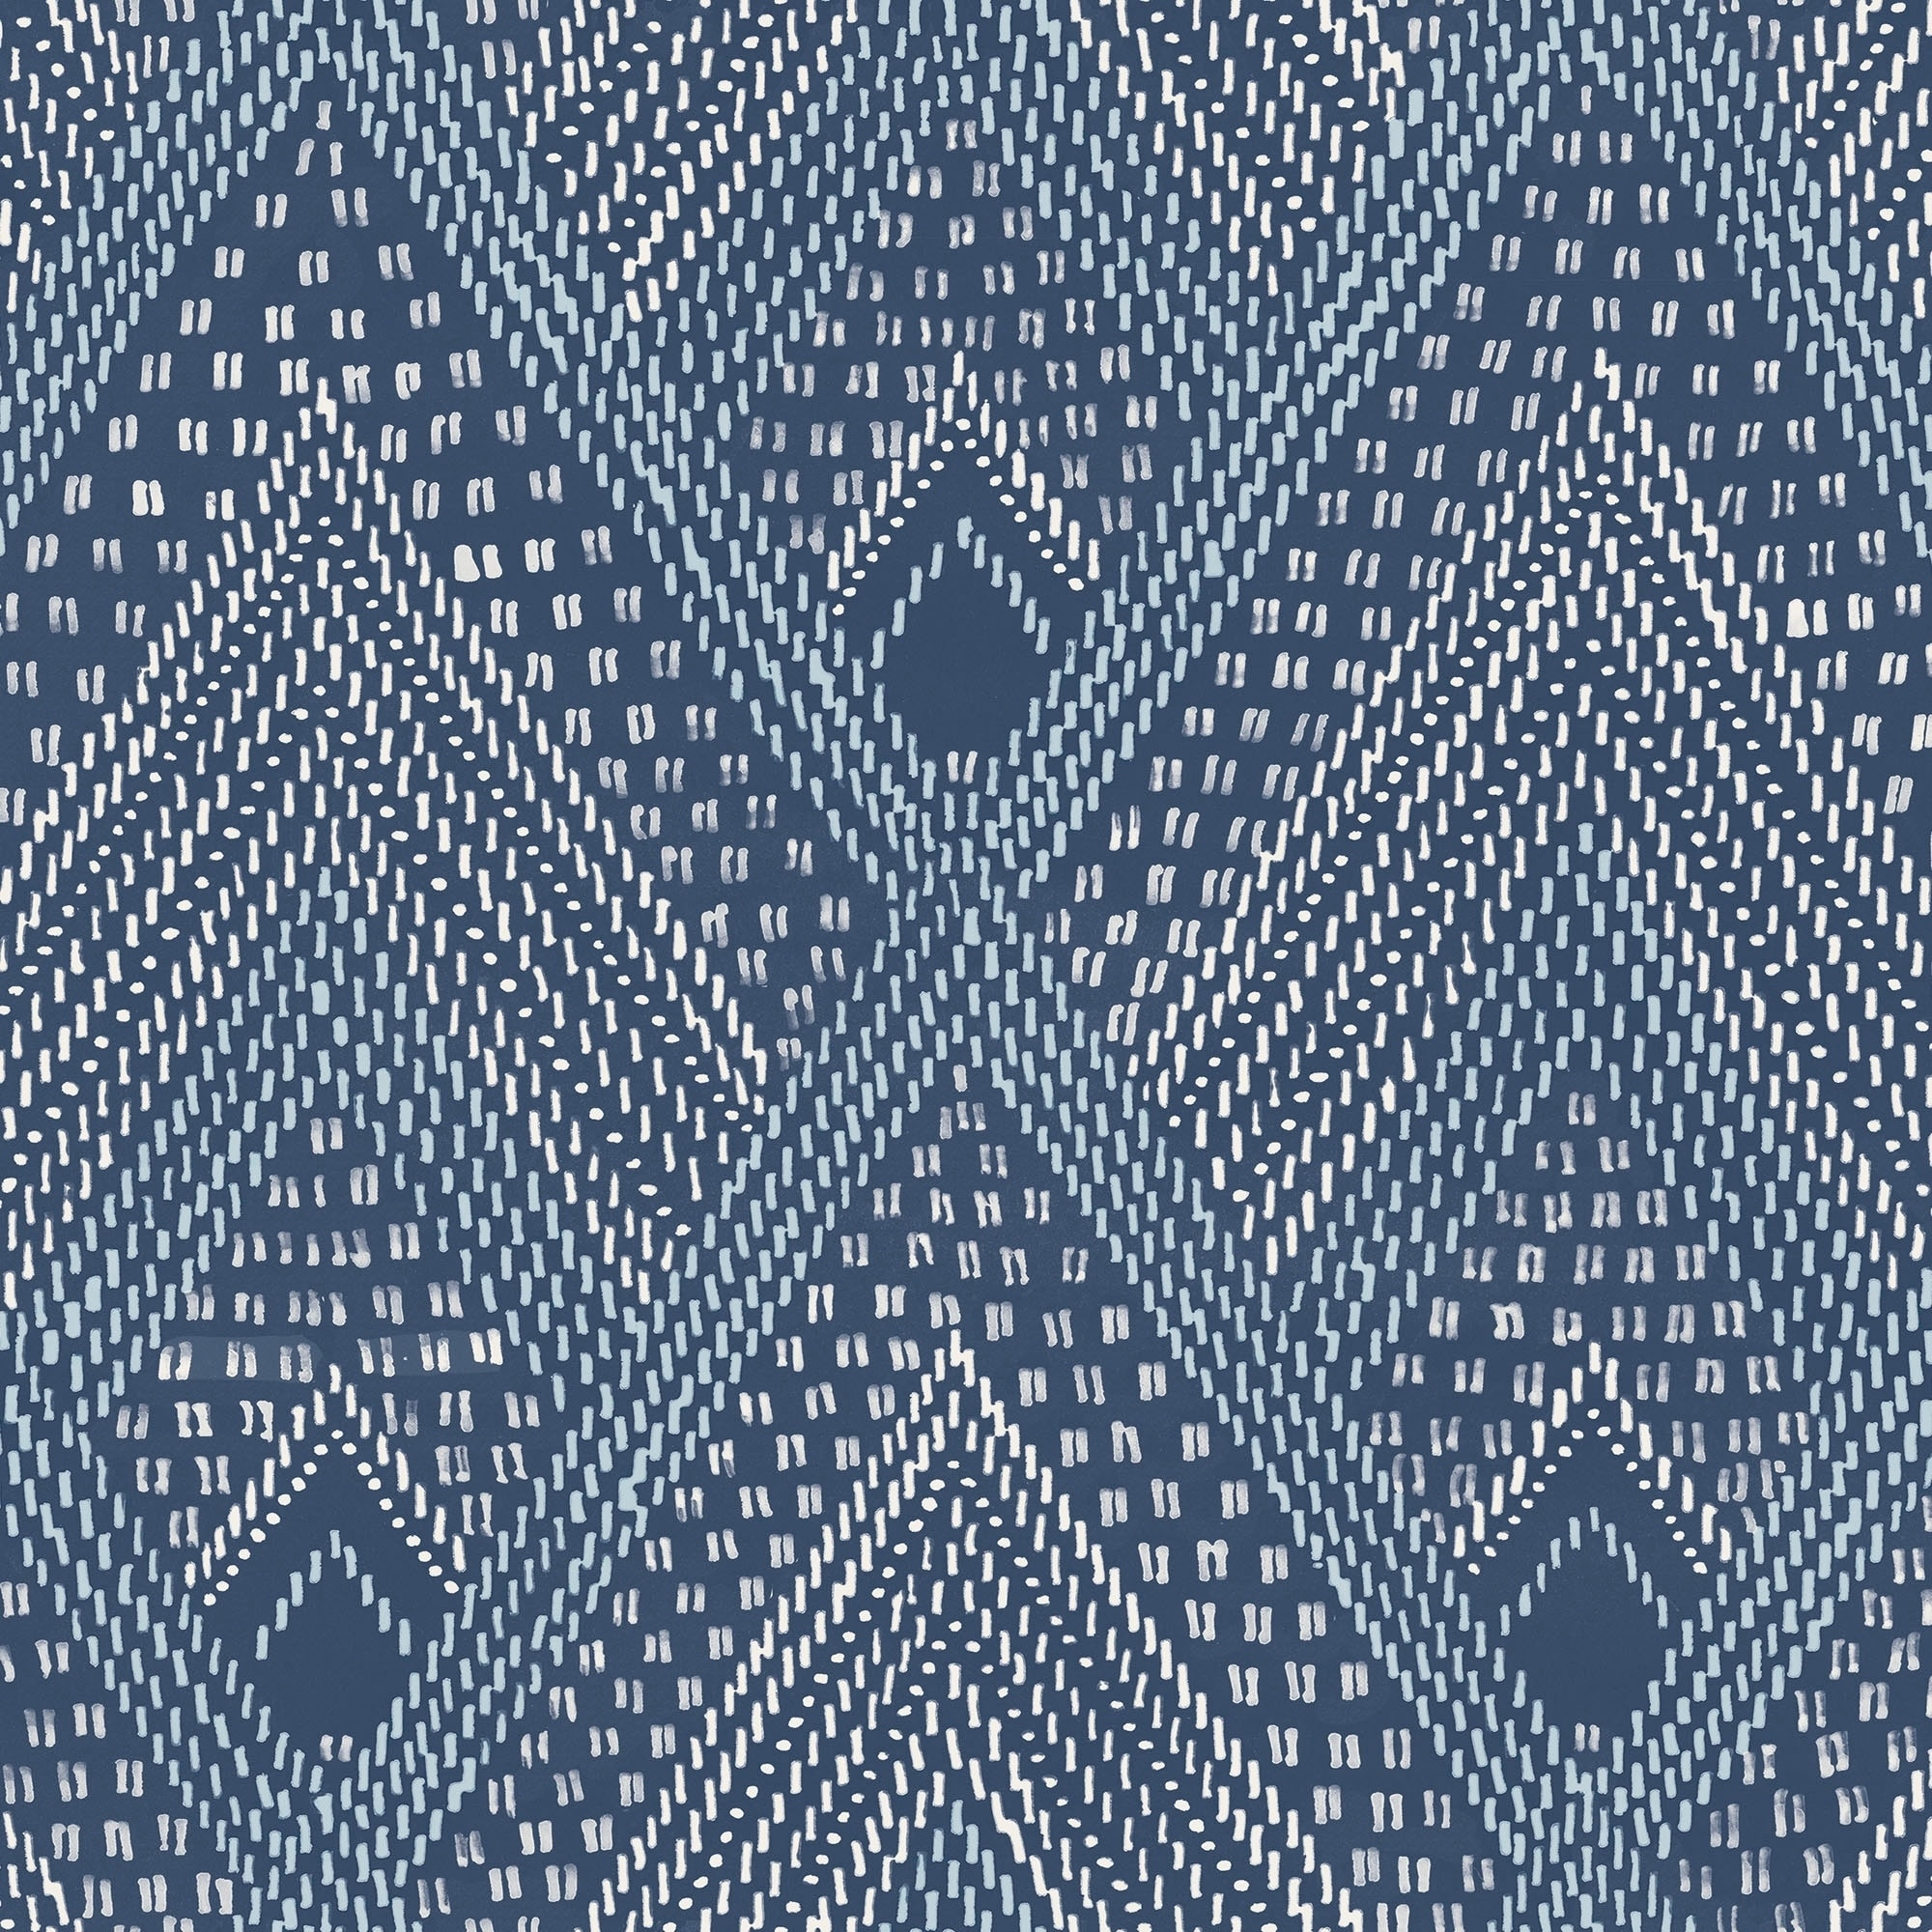 Shop Matte Panama Boho Diamonds Wallpaper 32 81 Feet Long X 20 5 Inchs Wide Black Sands And Charcoal On Sale Overstock 30270560